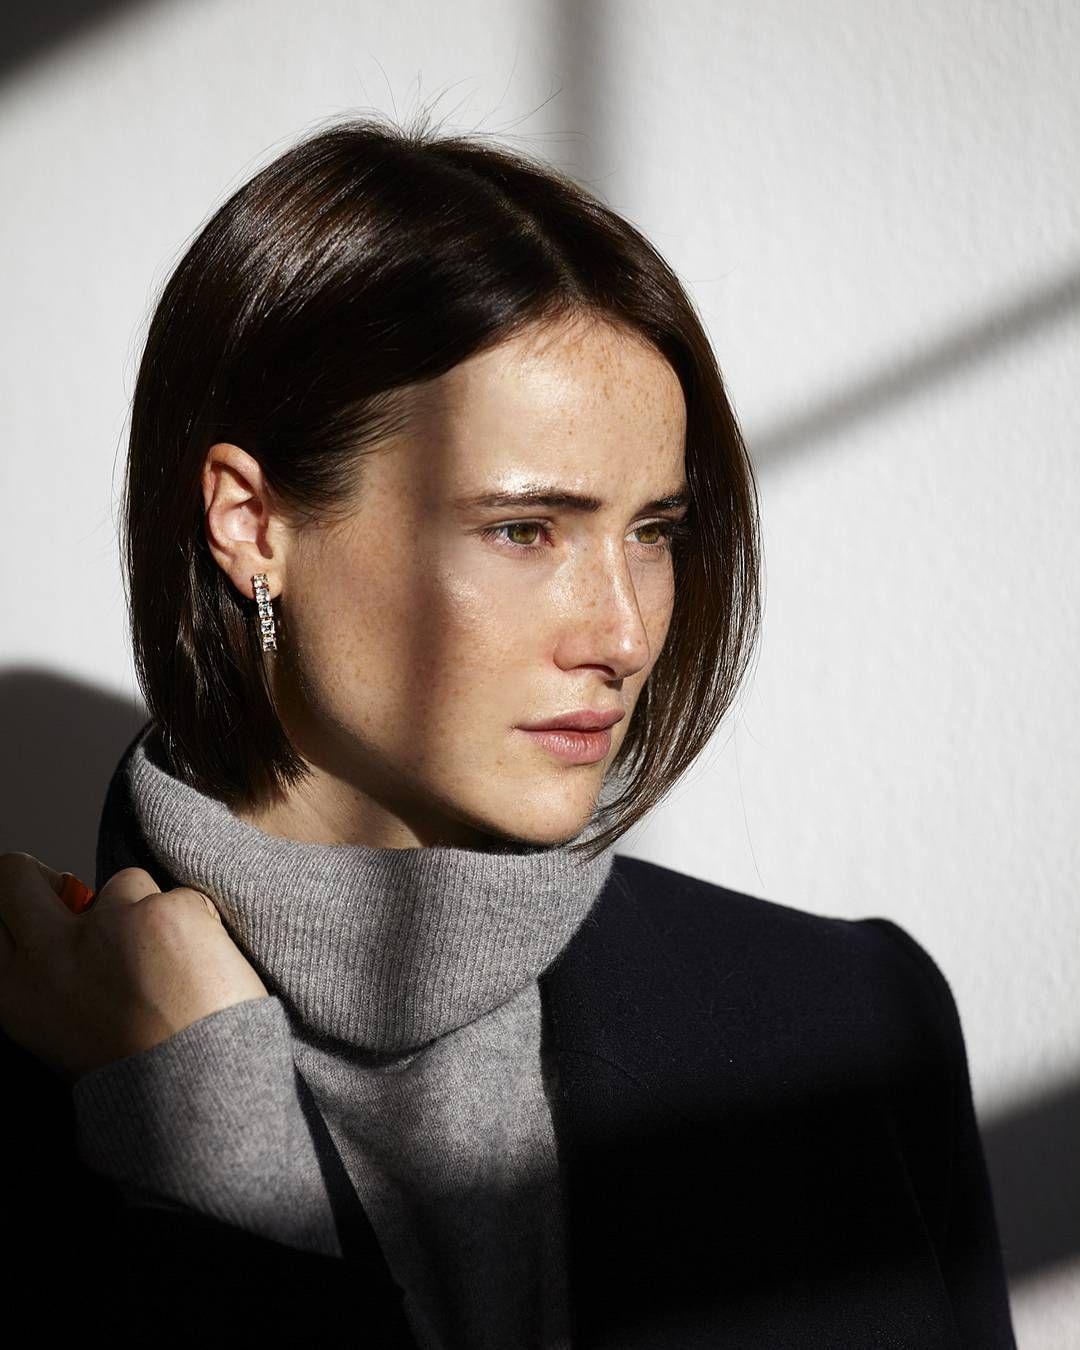 Men haircut styles 2018 frisurentrends u trendfrisuren   frisuren u hairstyles  tolle